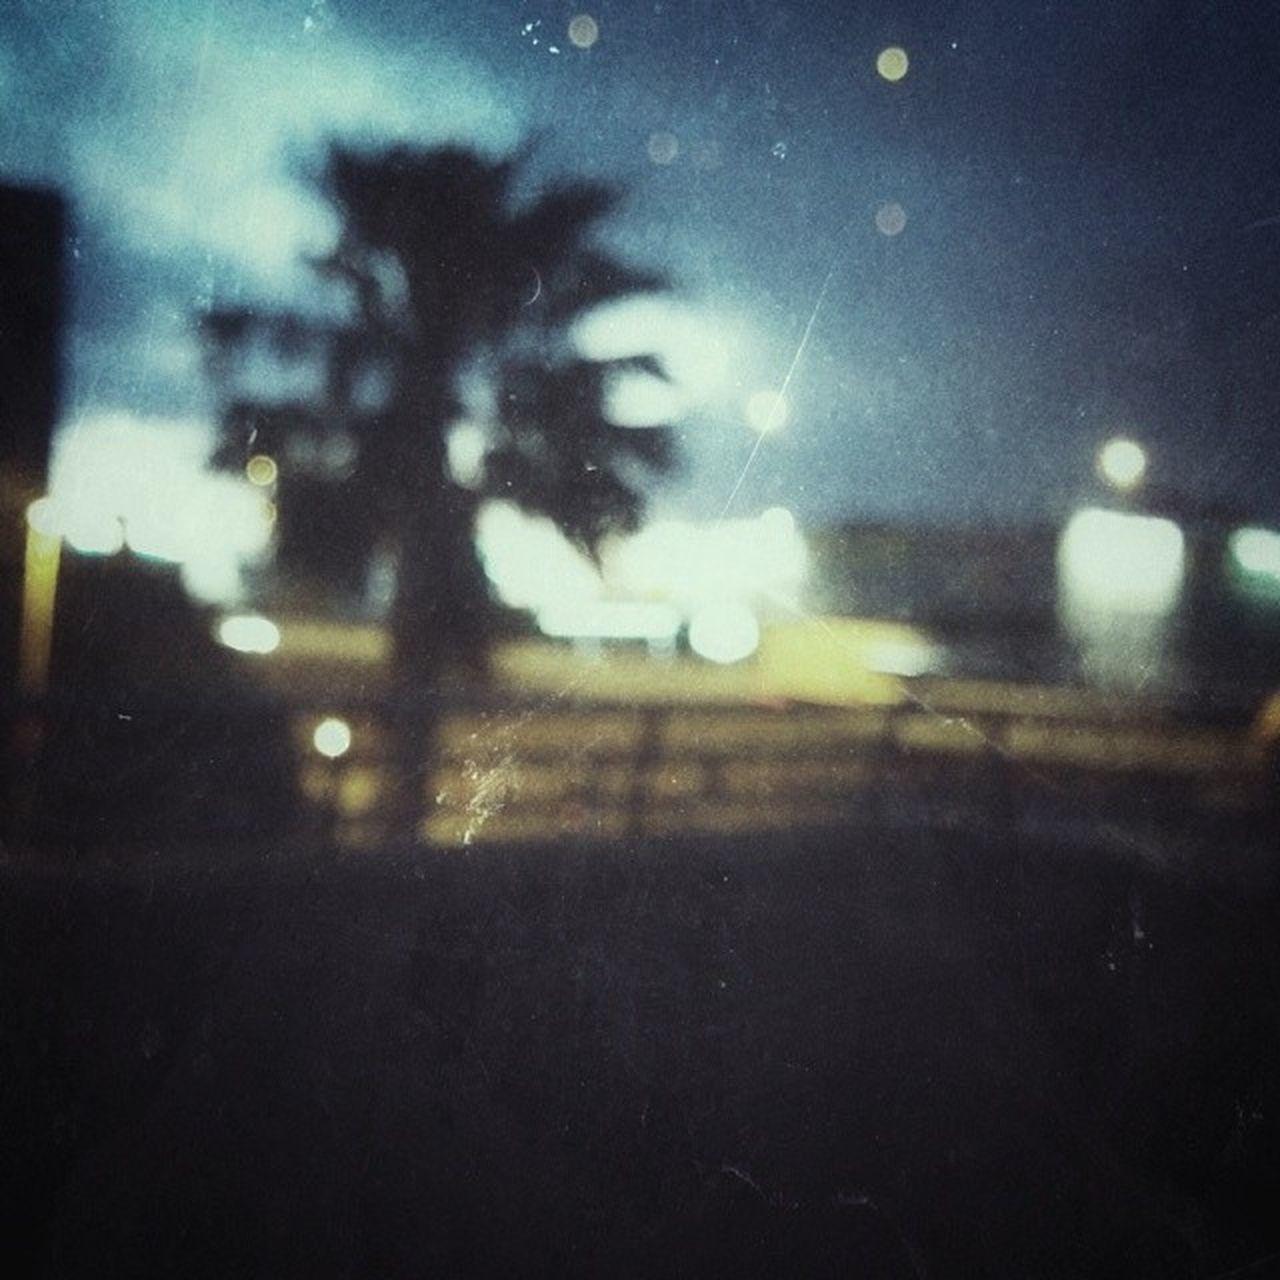 weather, night, defocused, no people, window, raindrop, close-up, road, outdoors, nature, transportation, tree, motion, sky